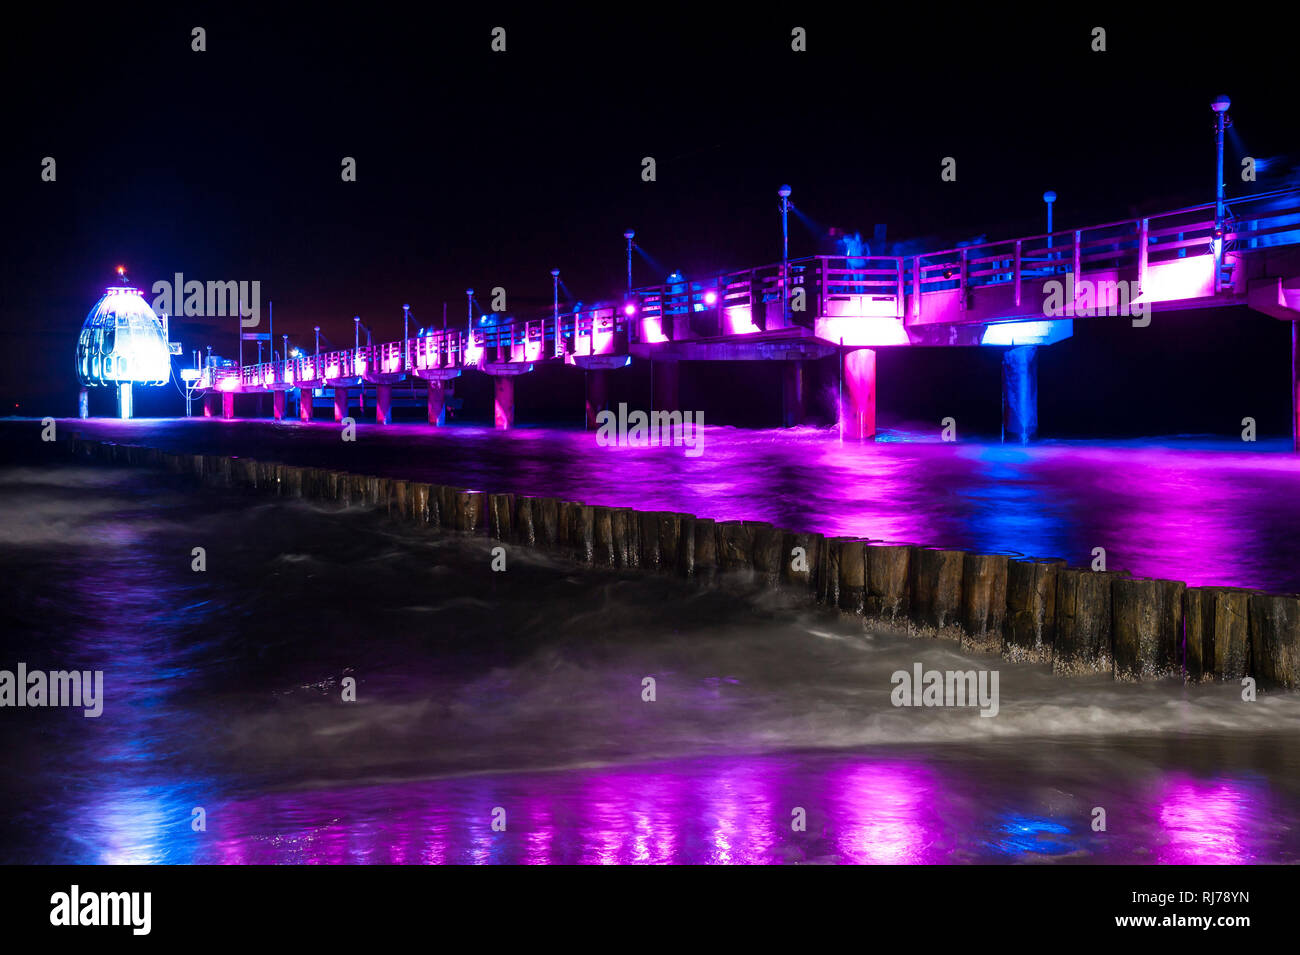 Beleuchtete Seebrücke in Zingst, Lichtkunst - Stock Image